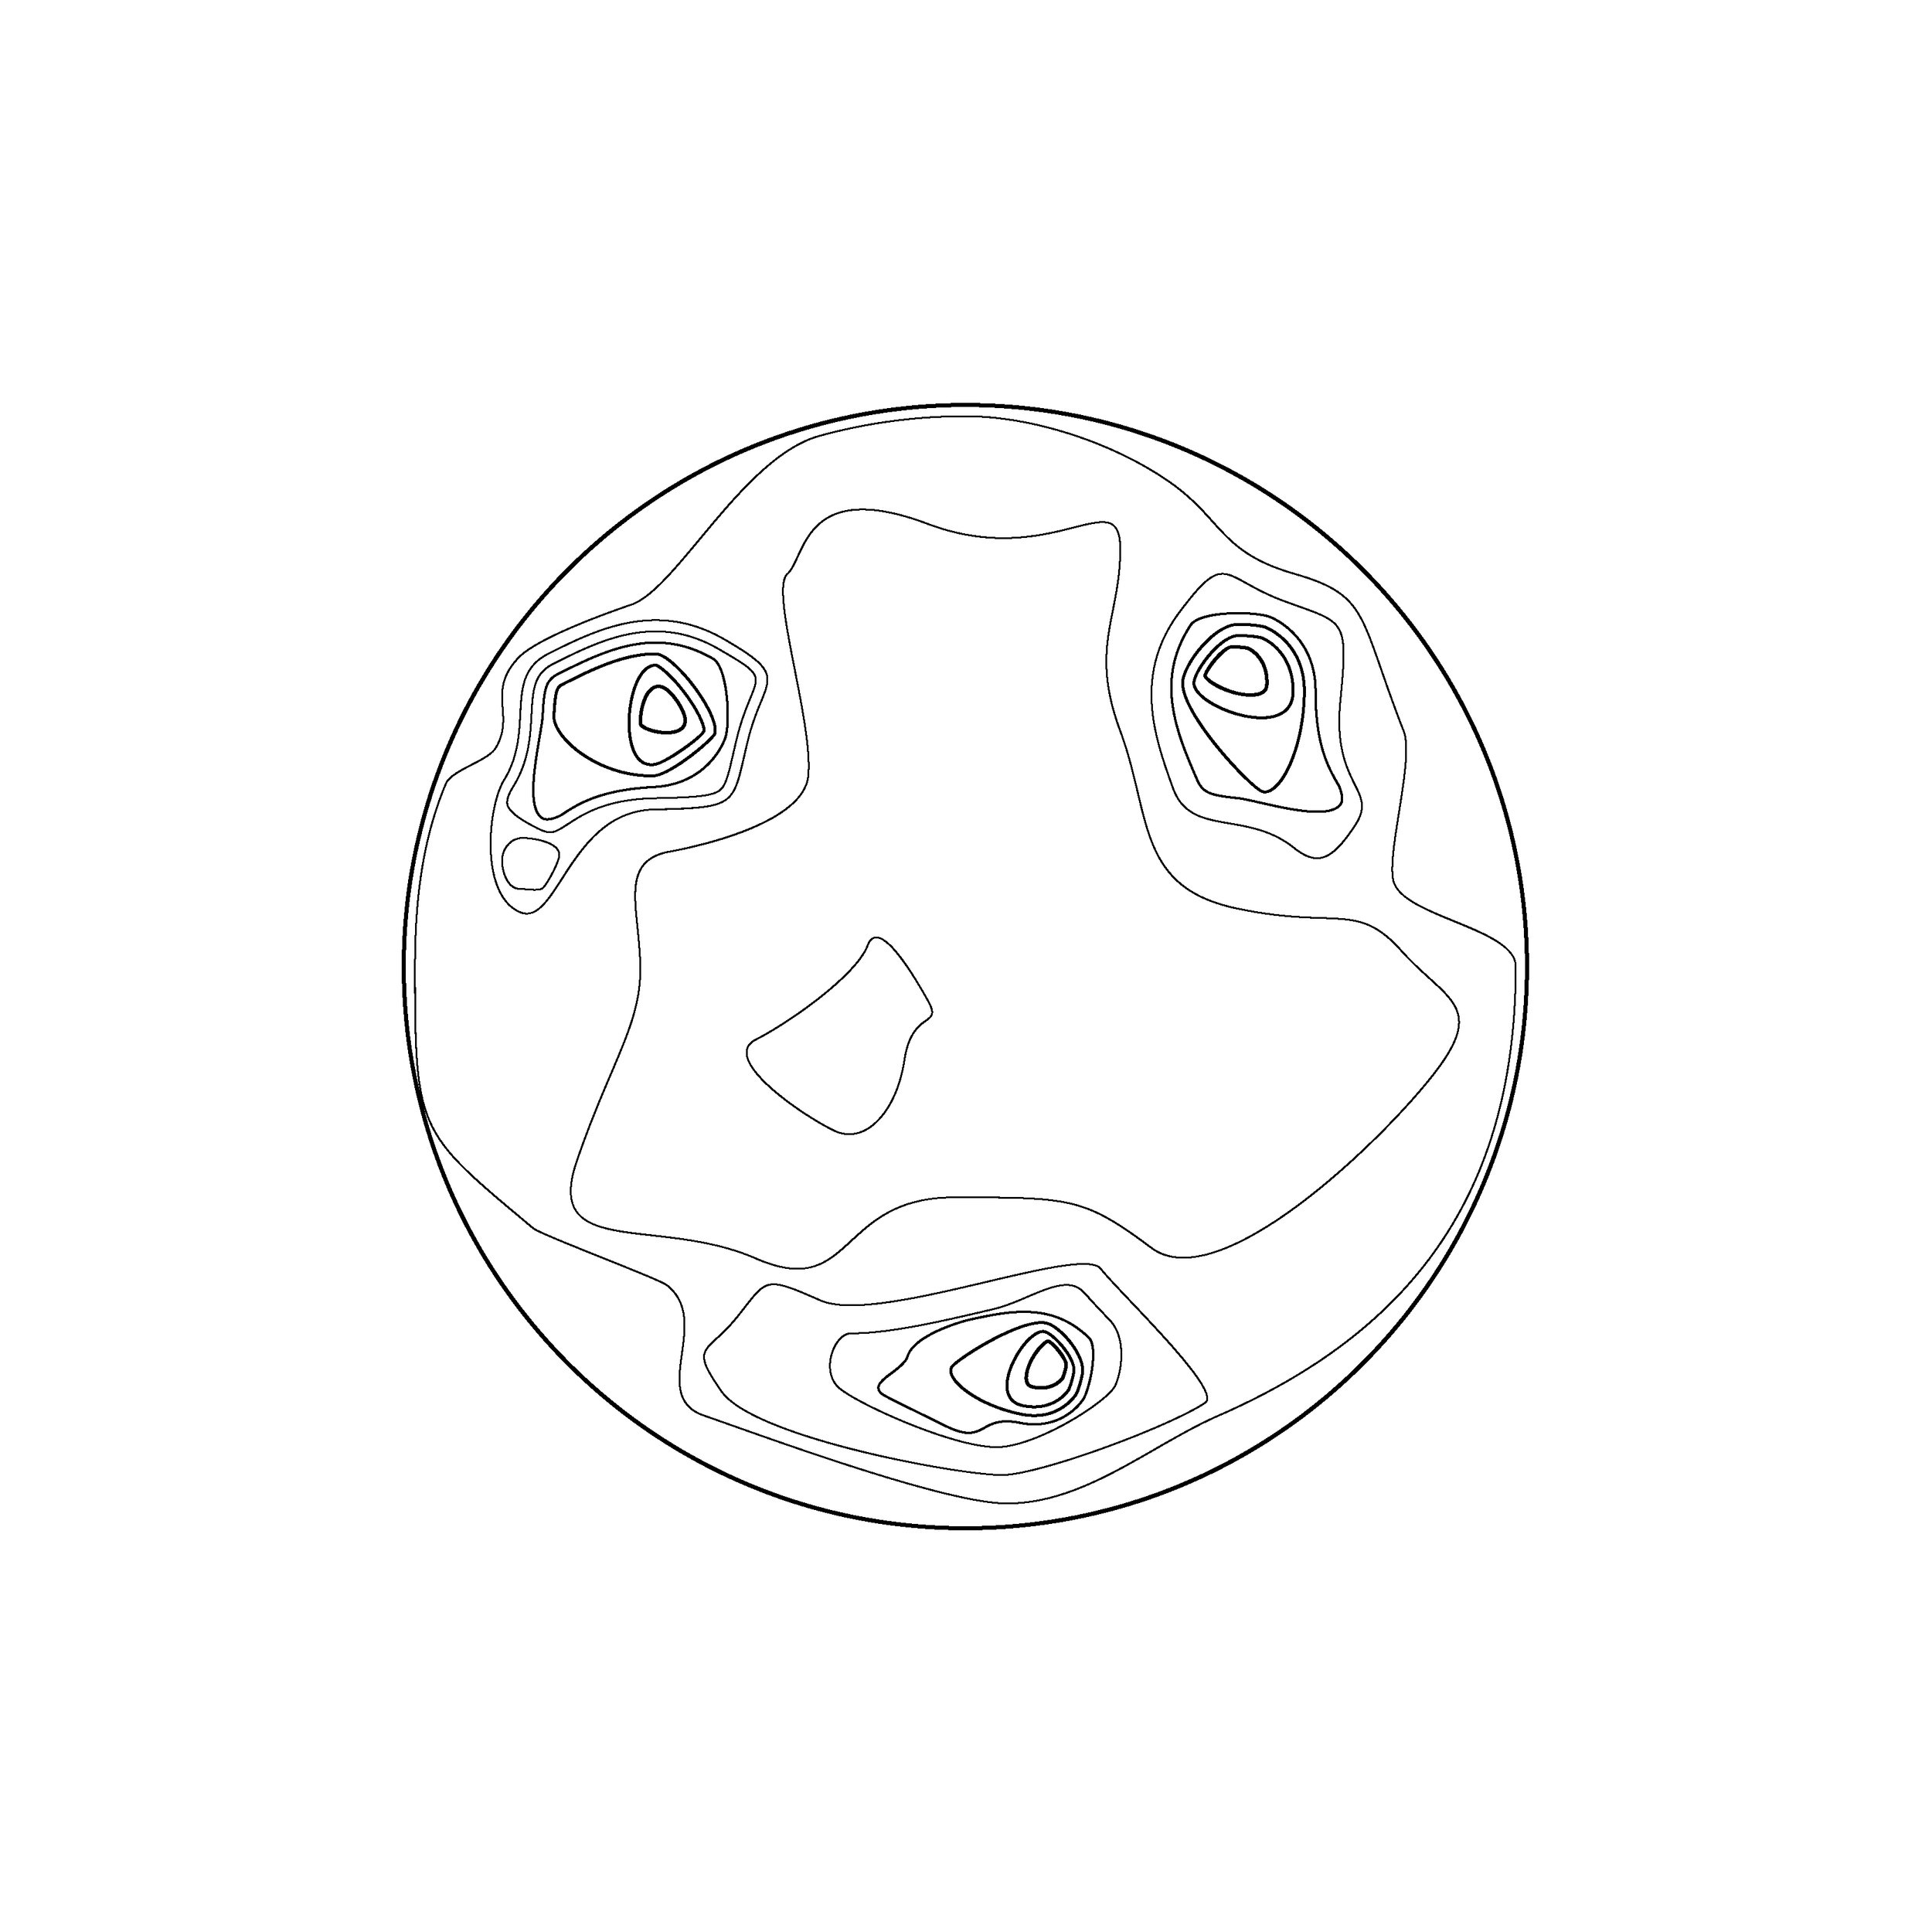 Linework Icons Squares - Melting Mahogane.jpg